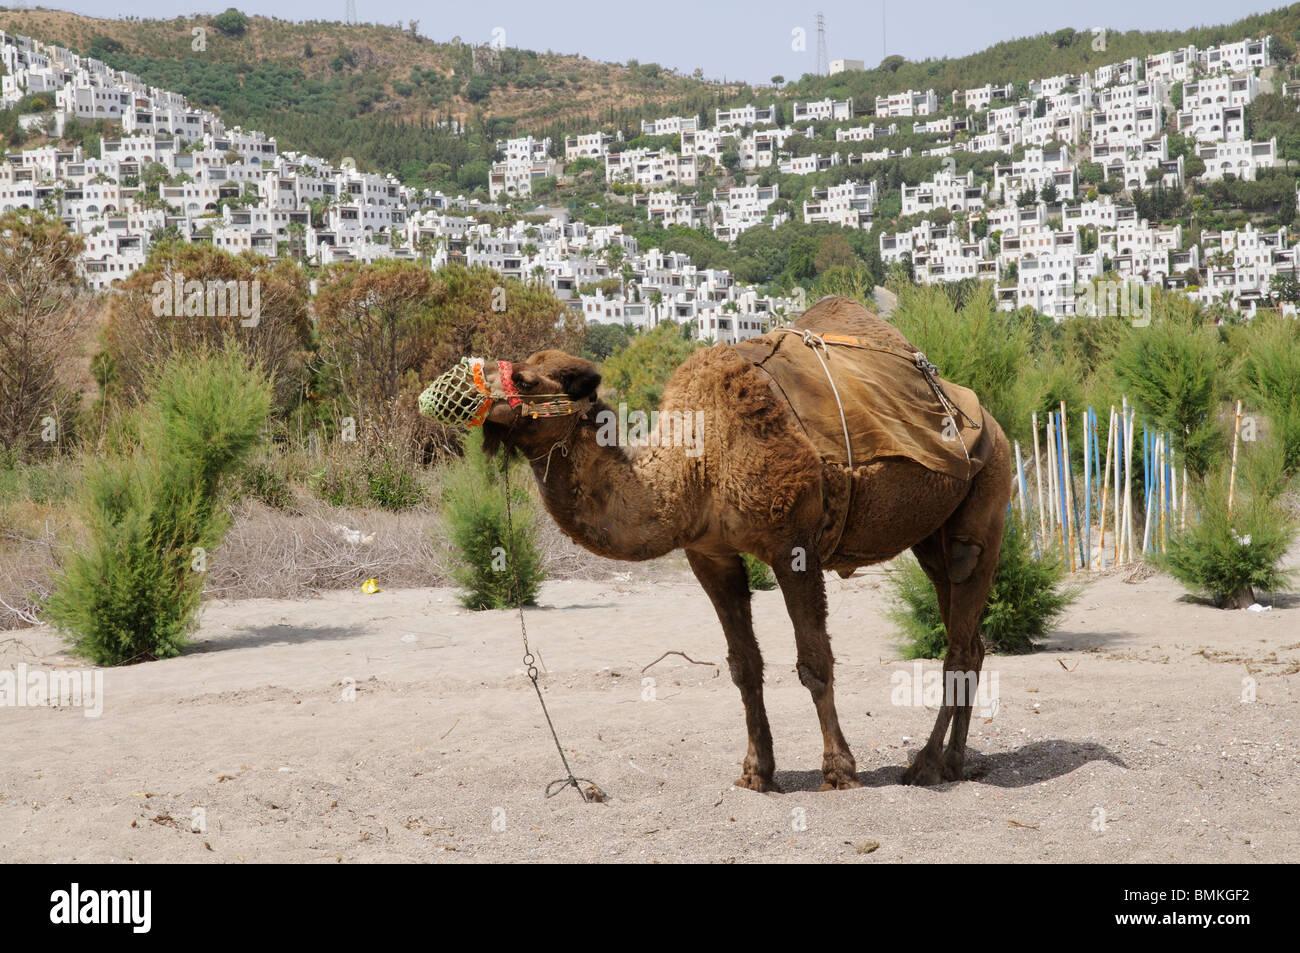 Camel Beach a seaside resort close to Bodrum south west Aegean Turkey Asia Minor - Stock Image